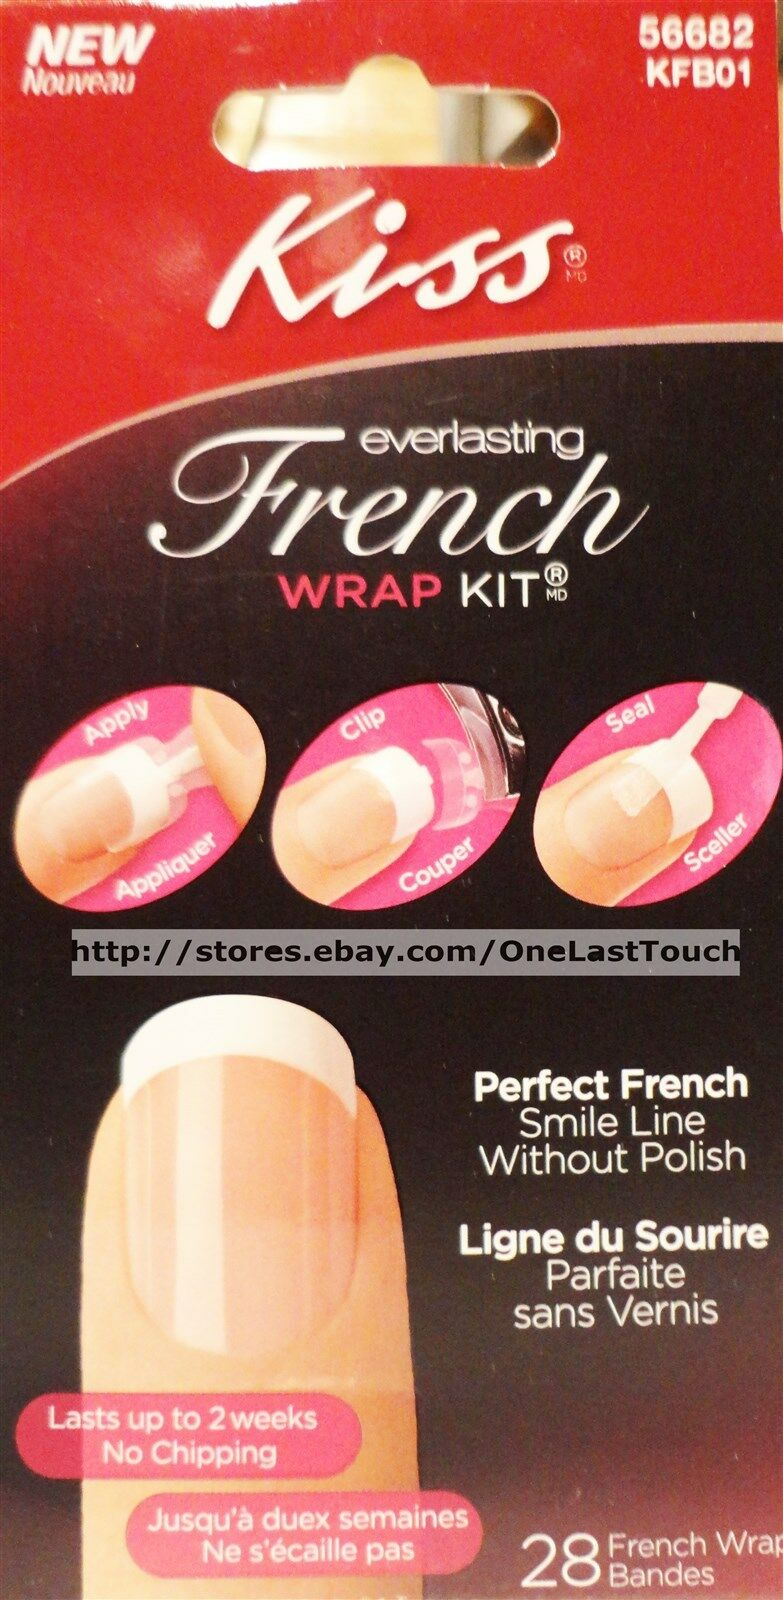 Kiss Everlasting French Wrap Kit 56682 Kfb01   eBay